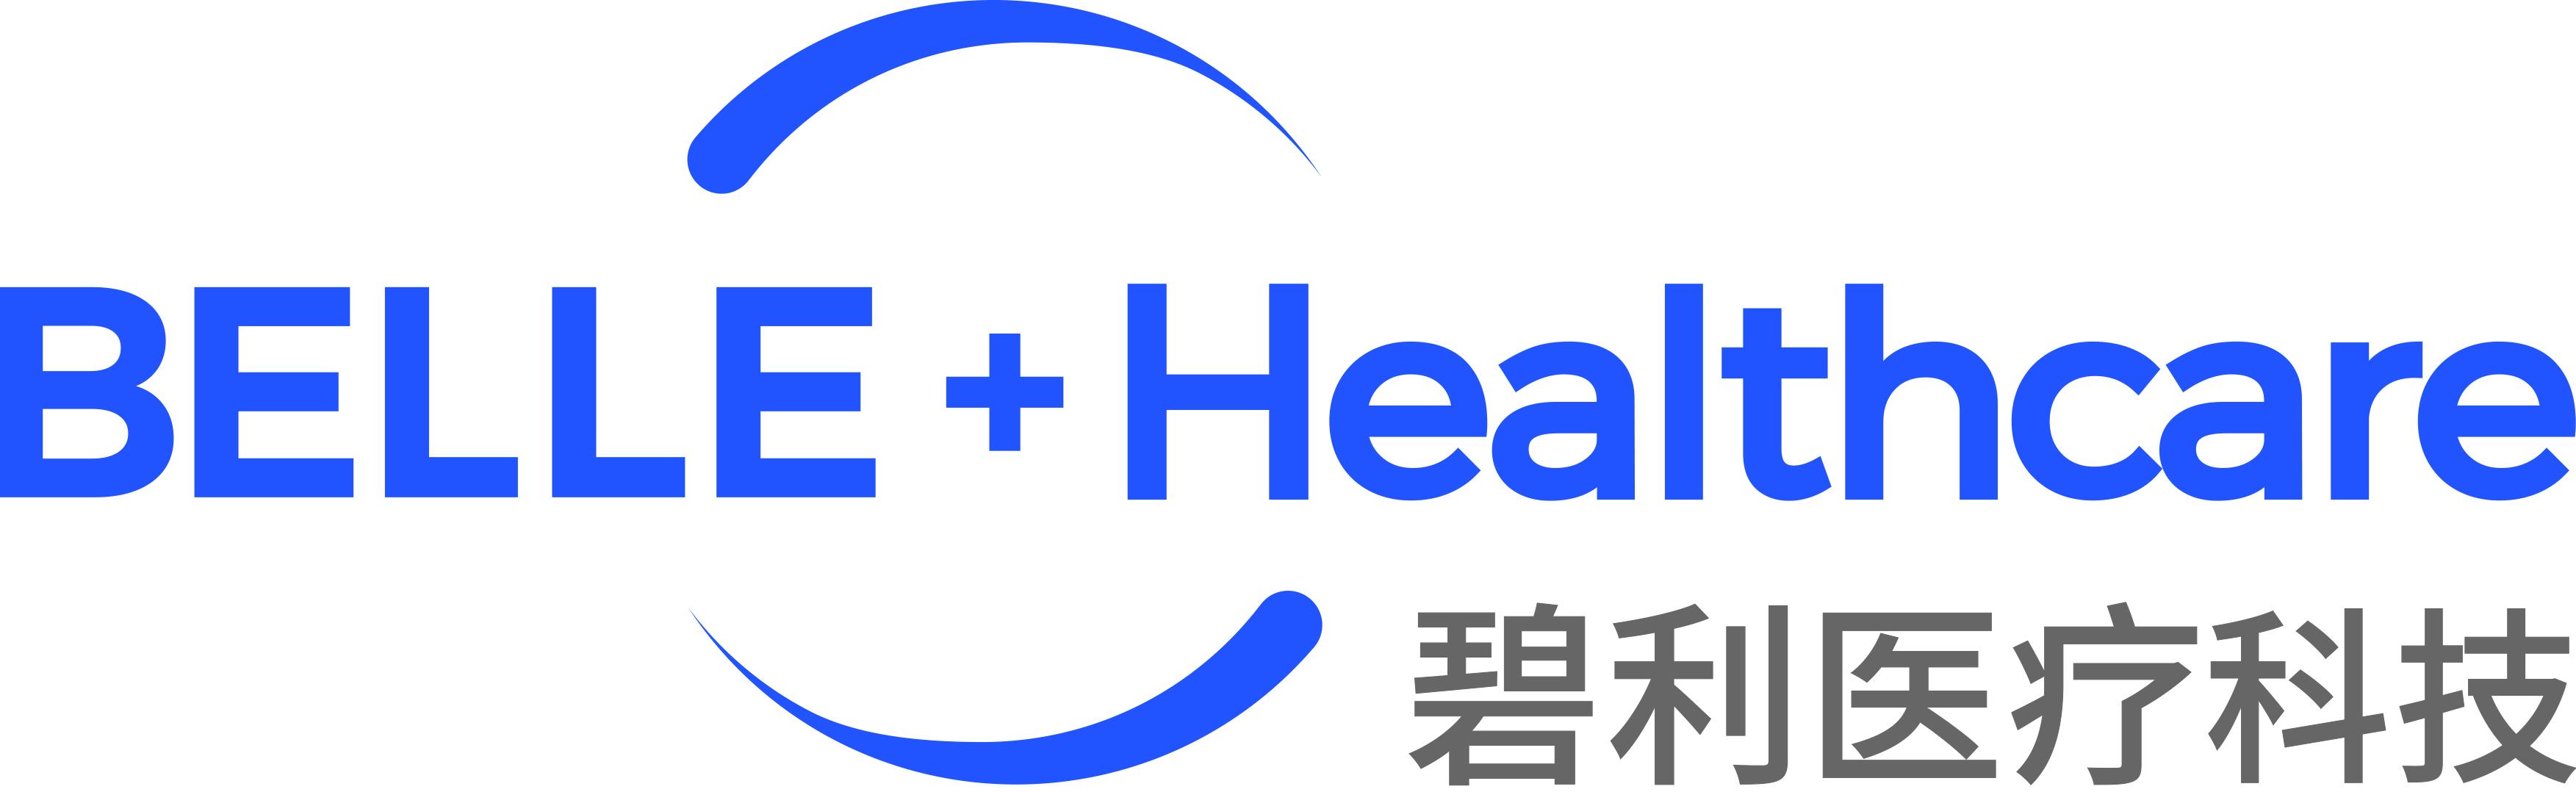 Belle Healthcare Medical Technology